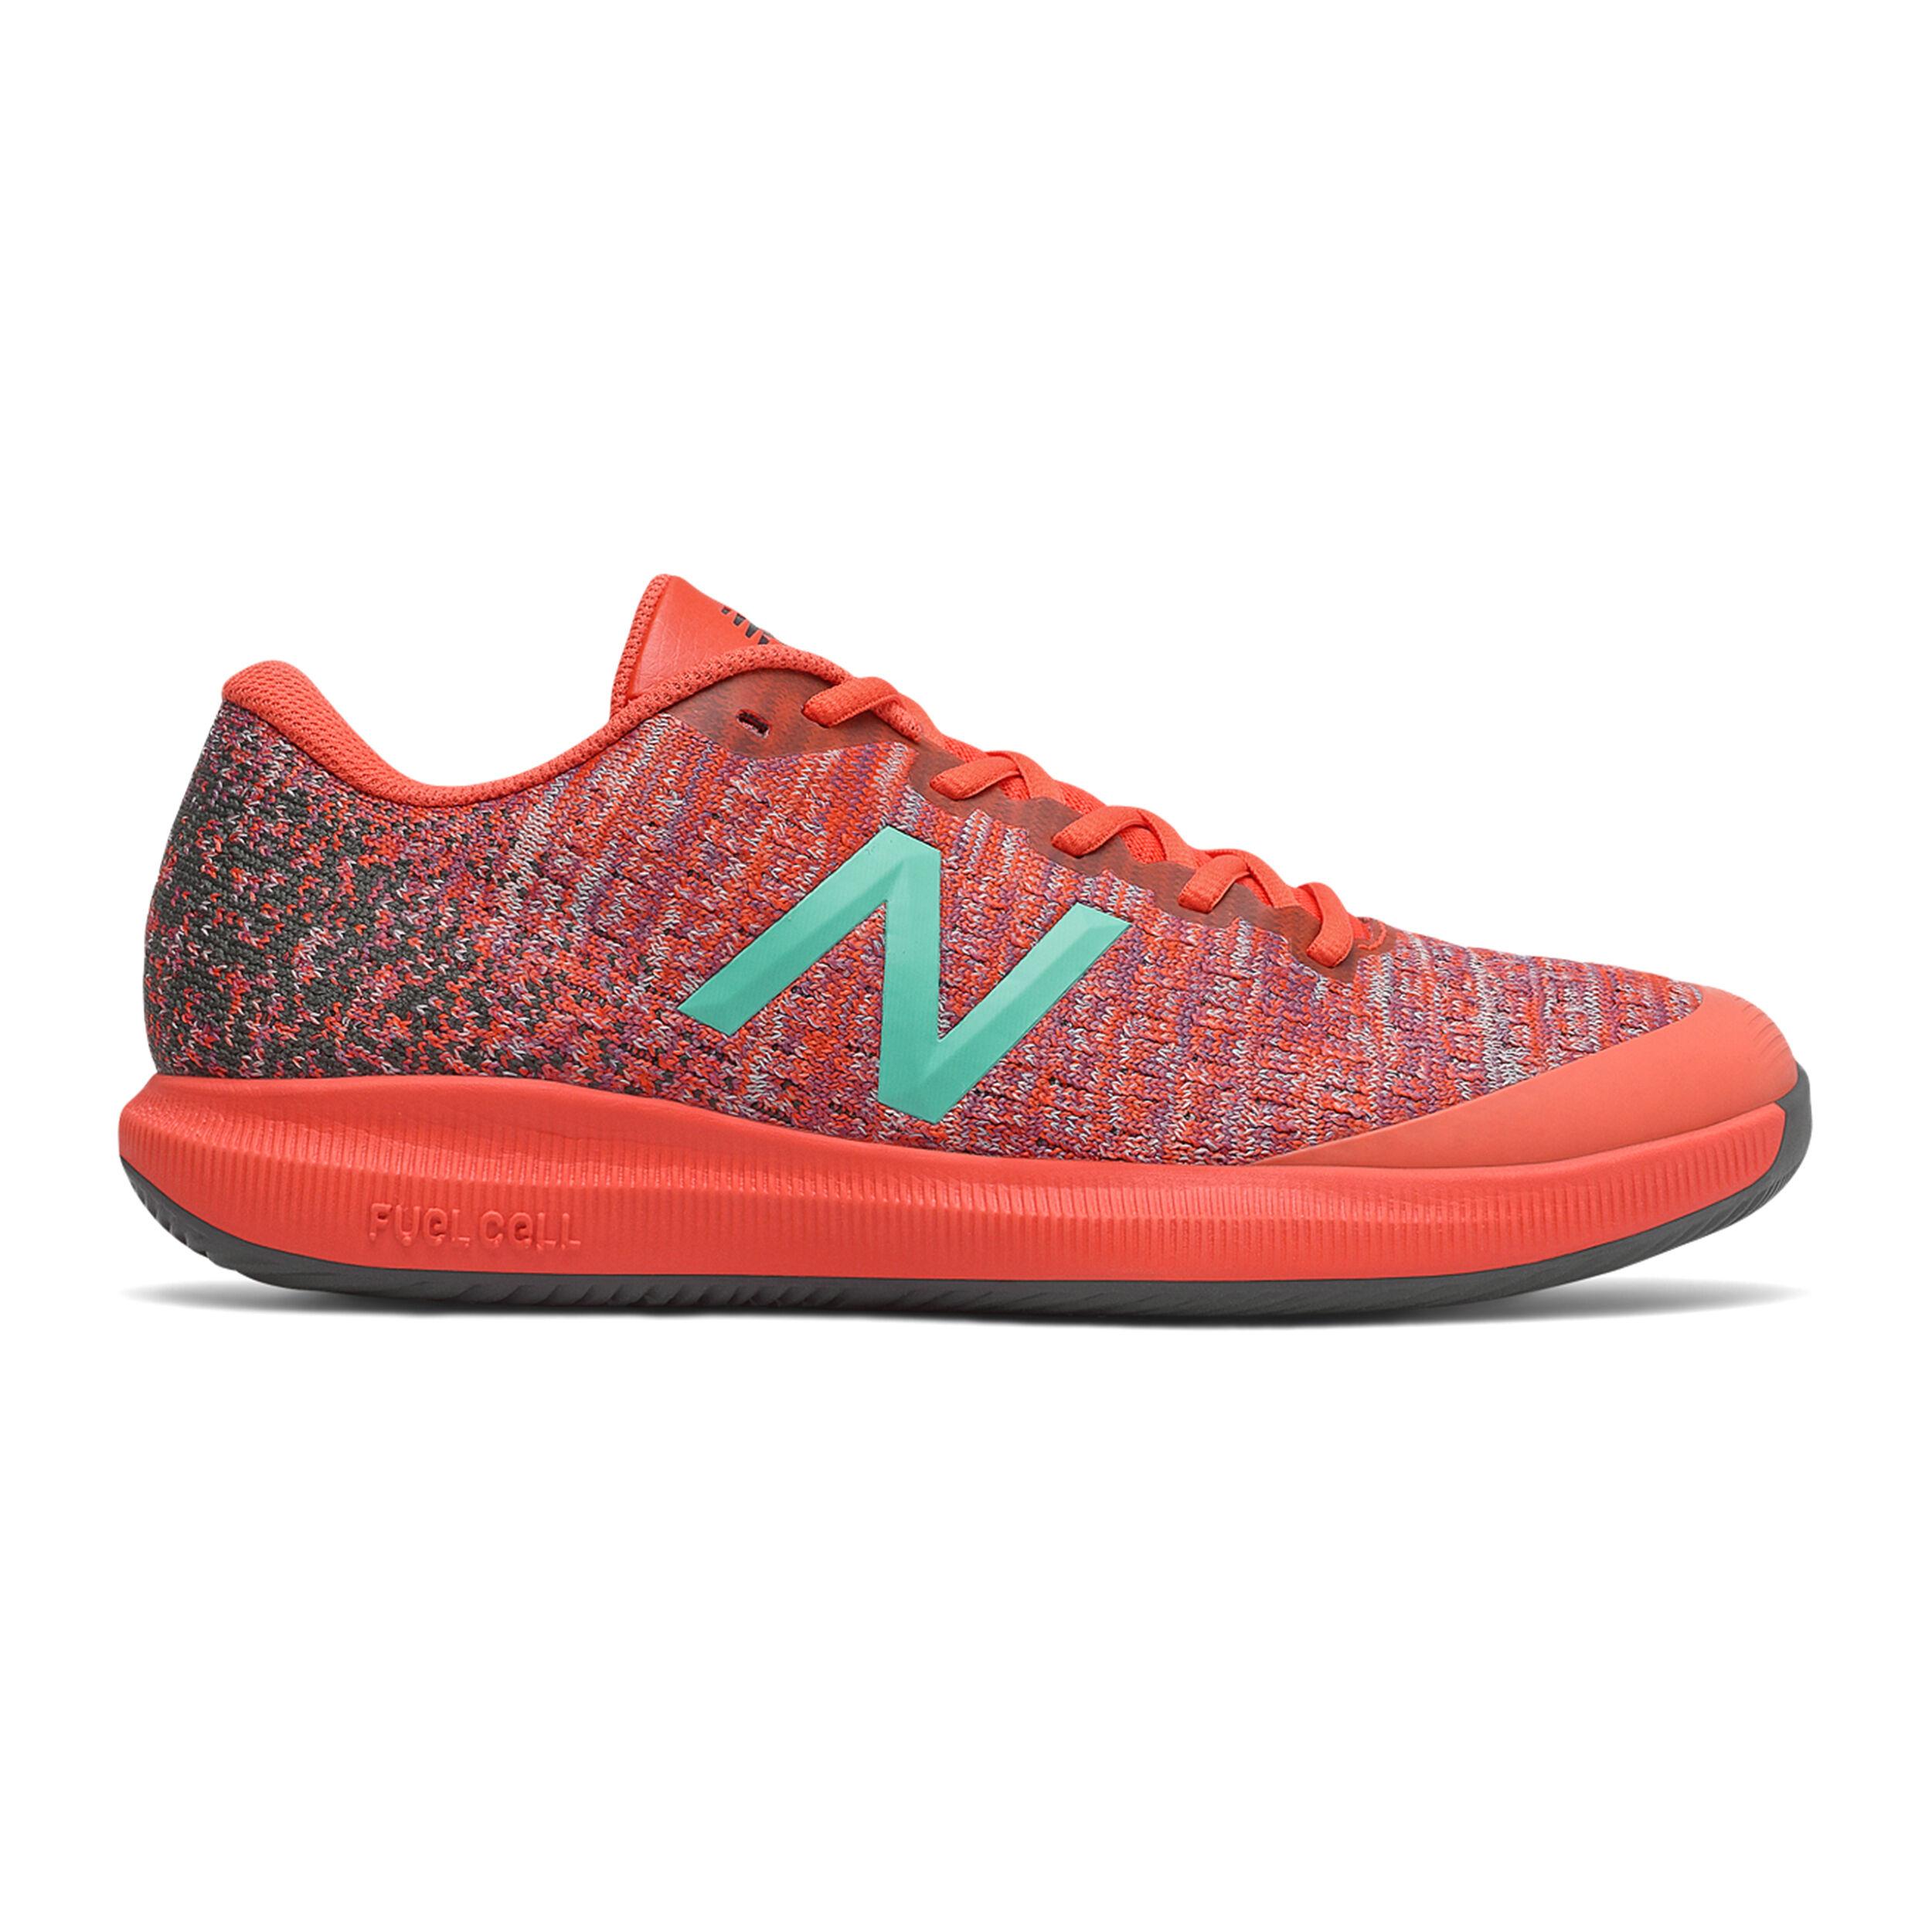 Chaussures de tennis de New Balance acheter en ligne   Tennis-Point